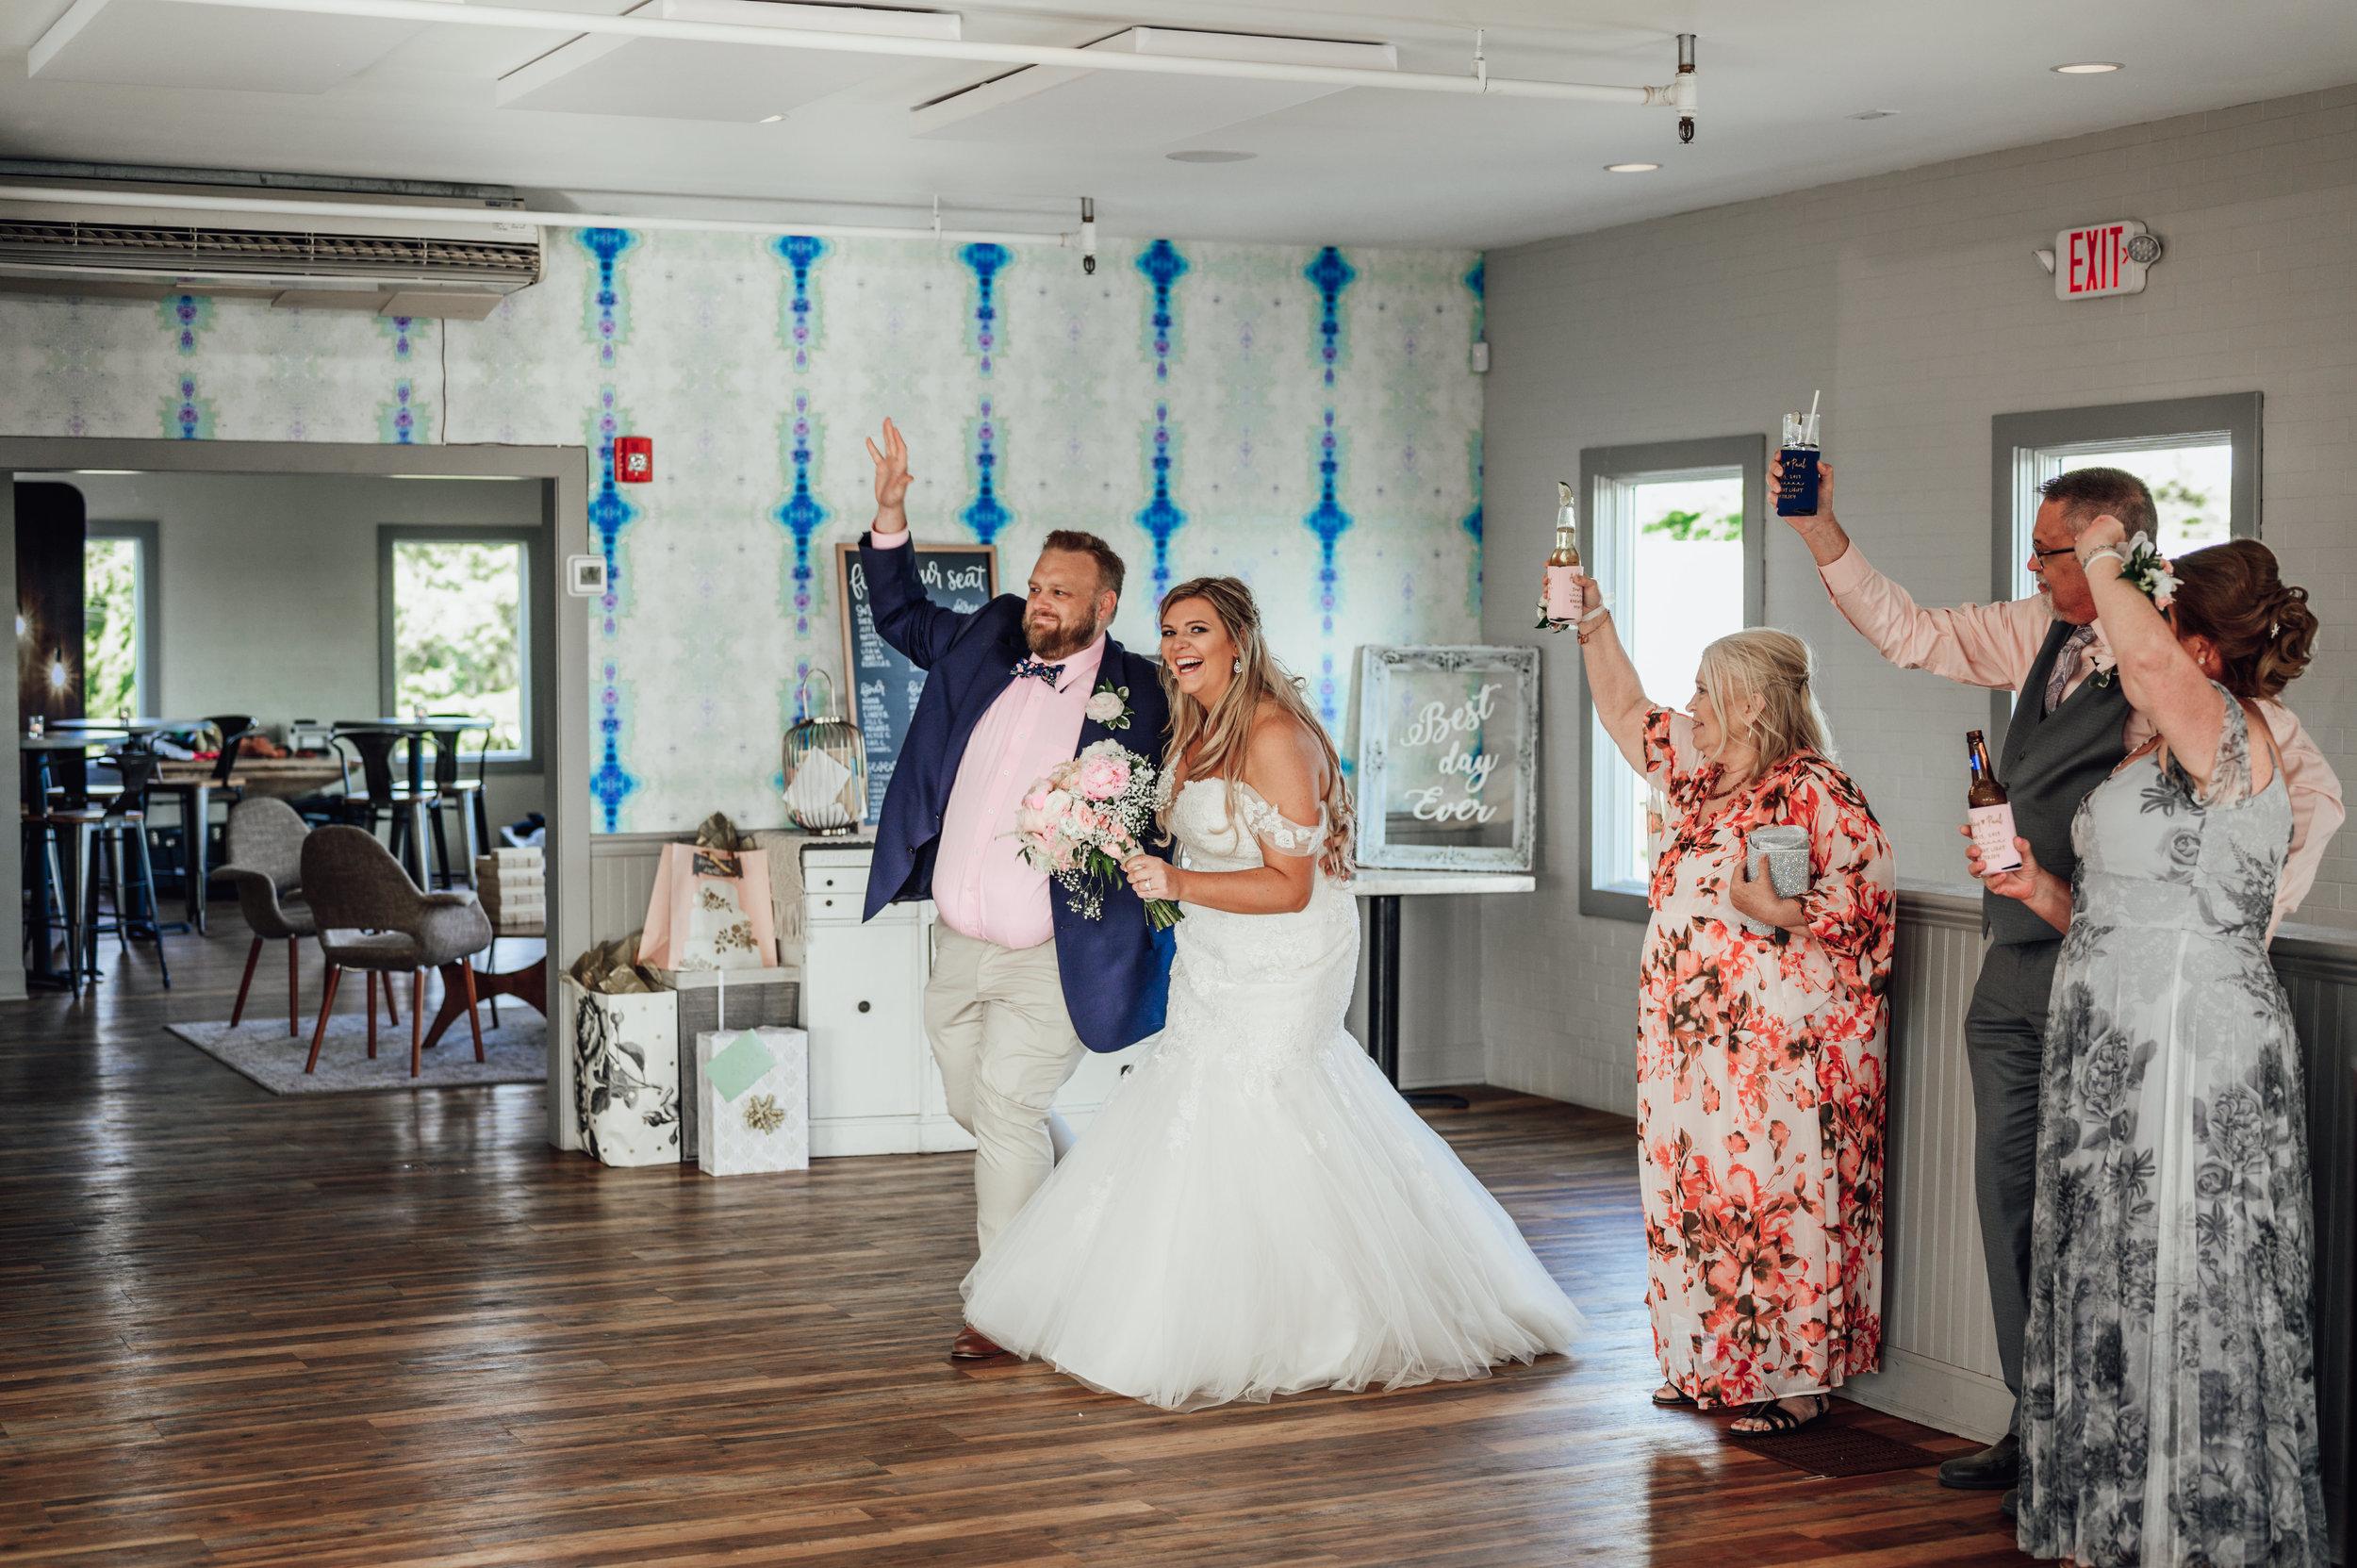 New Jersey Wedding Photographer, Felsberg Photography LBI wedding photography 88.jpg